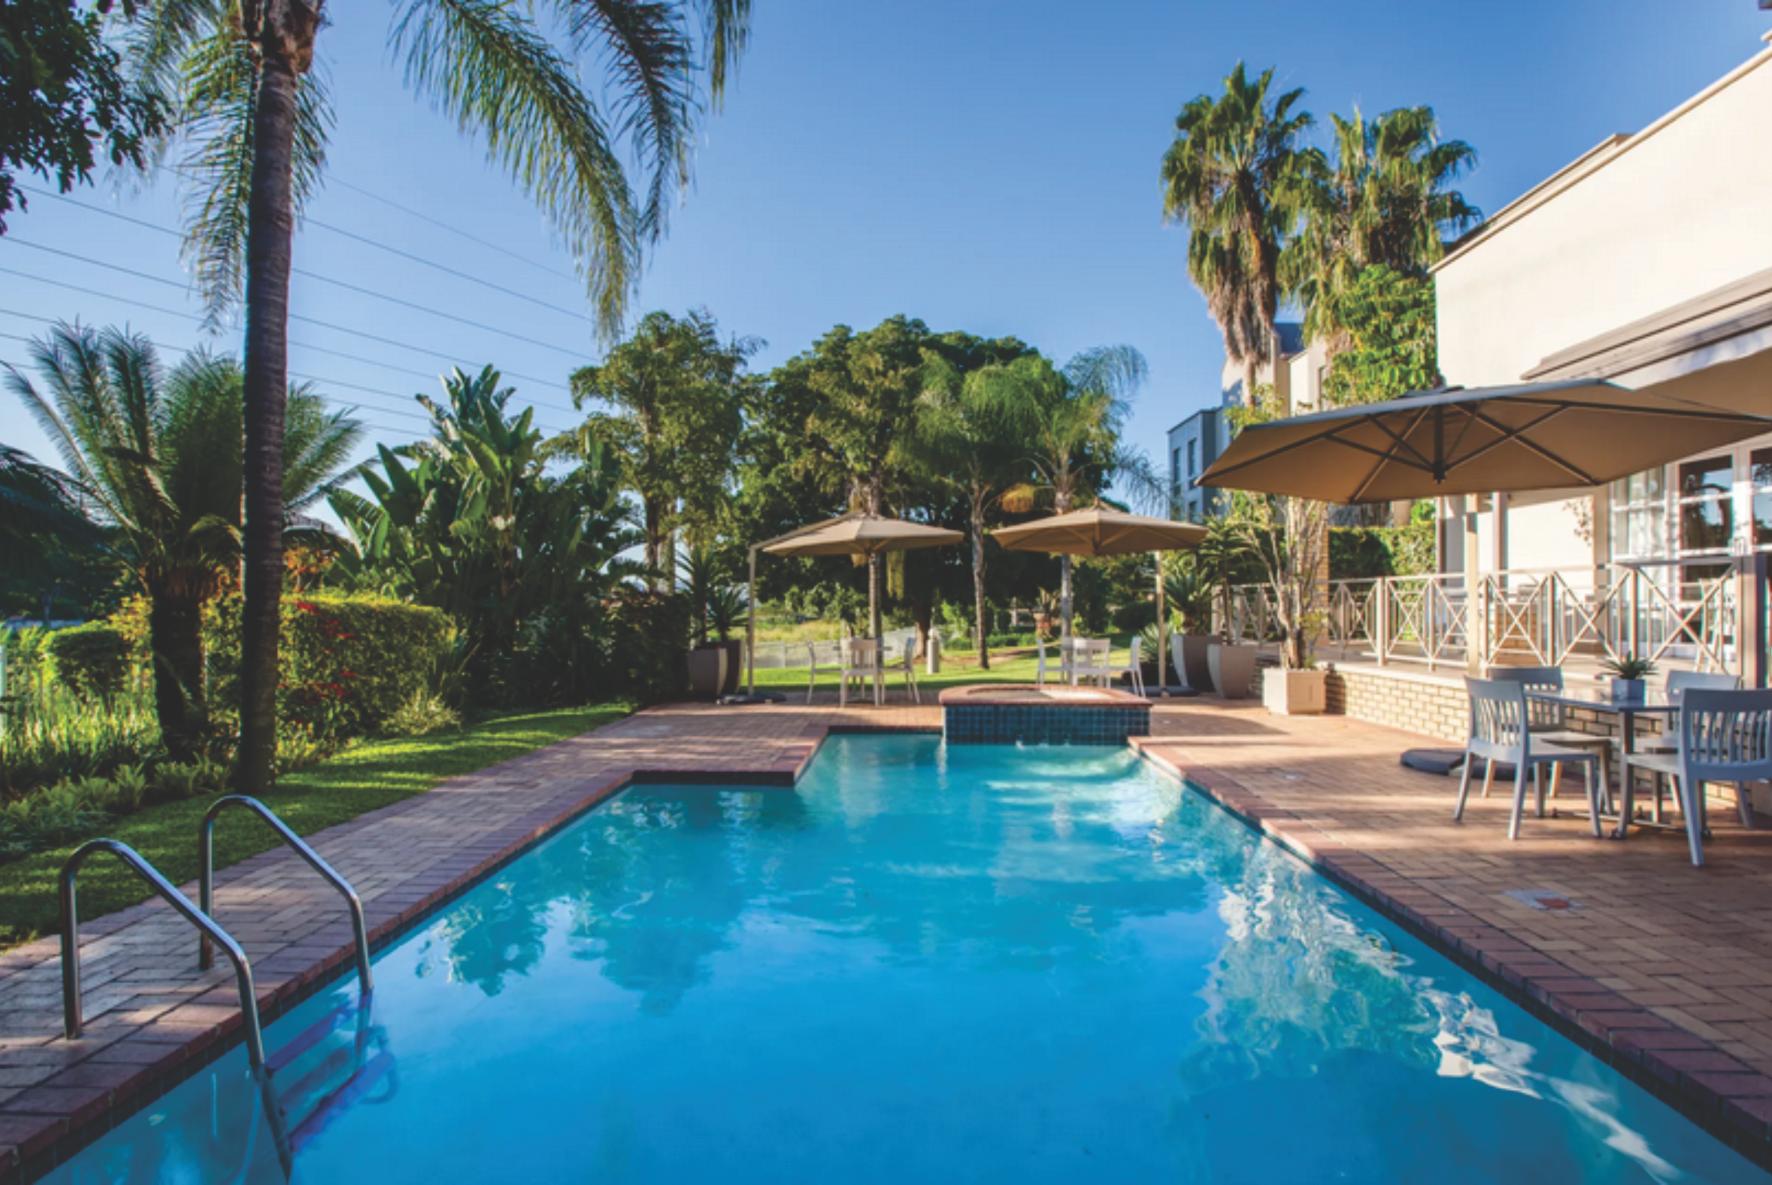 Road Lodge pool